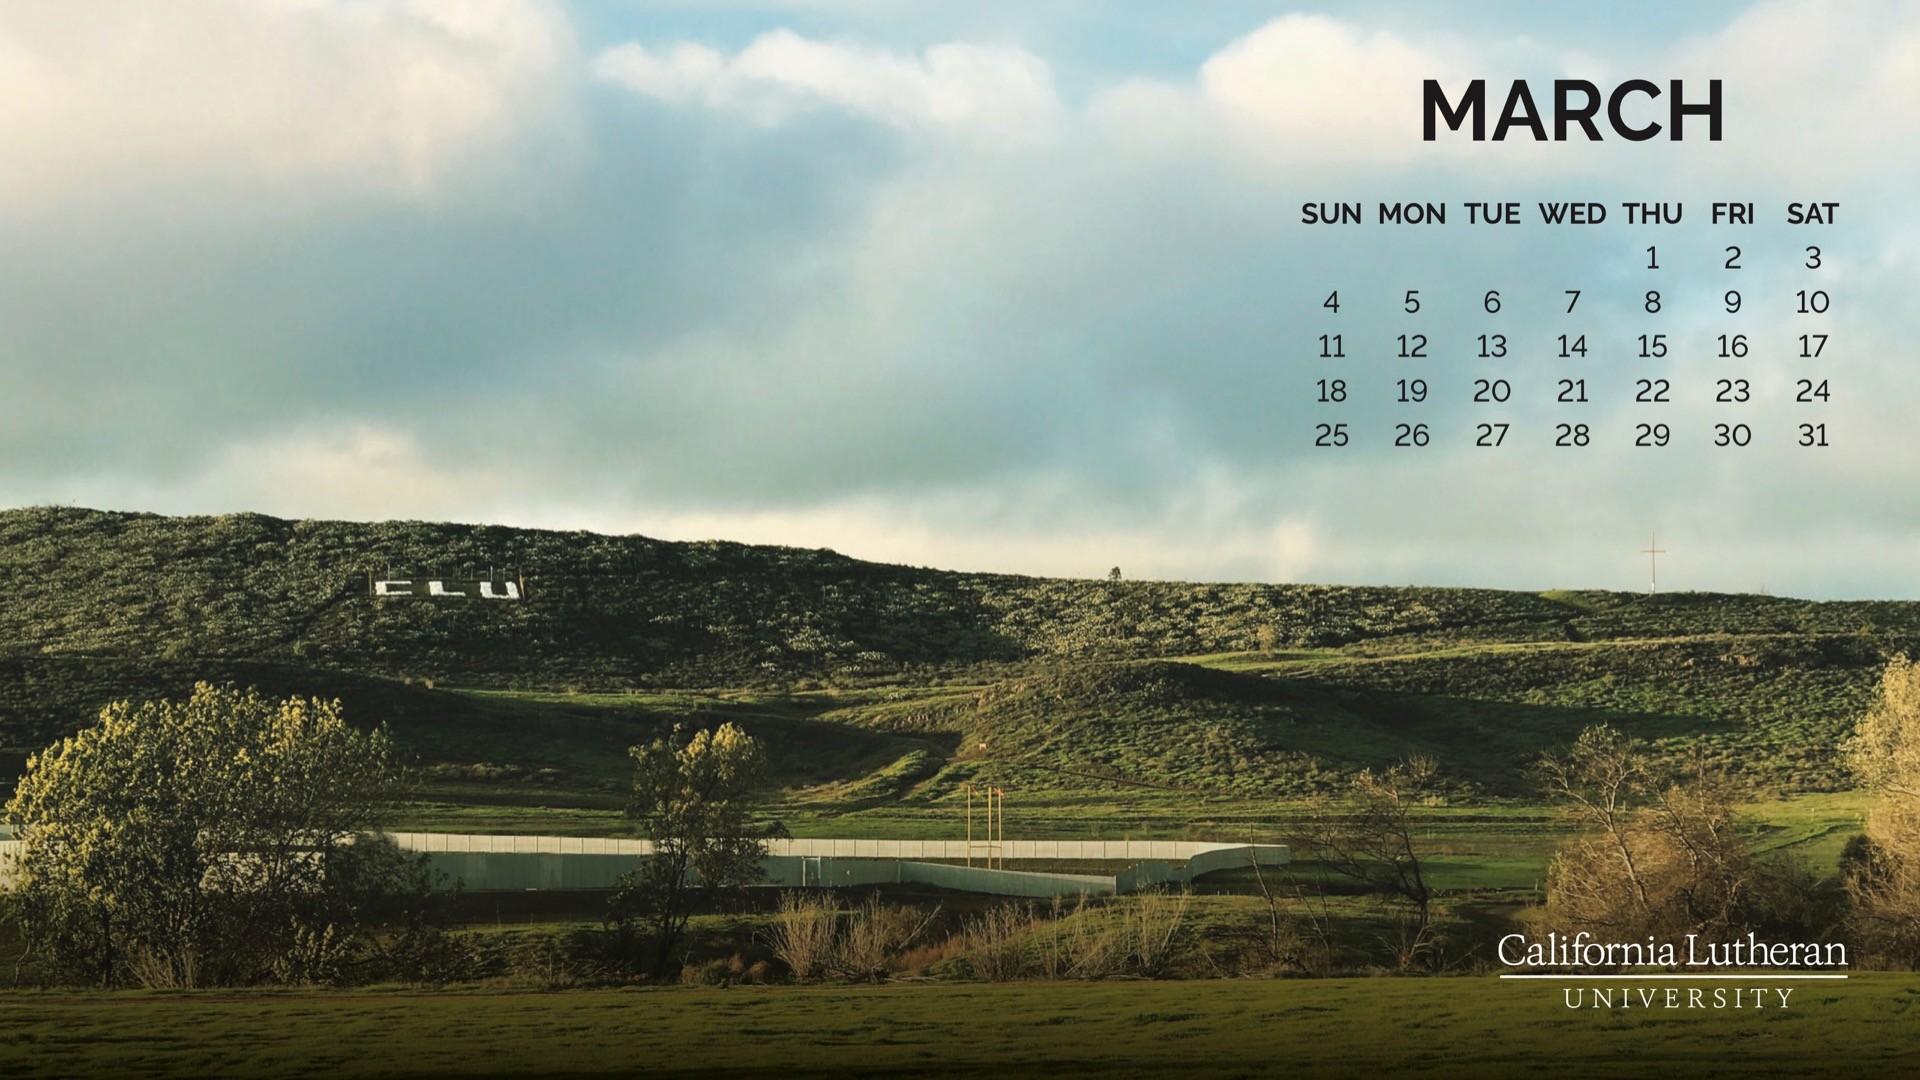 desktop wallpapers calendar march 2018 44 images